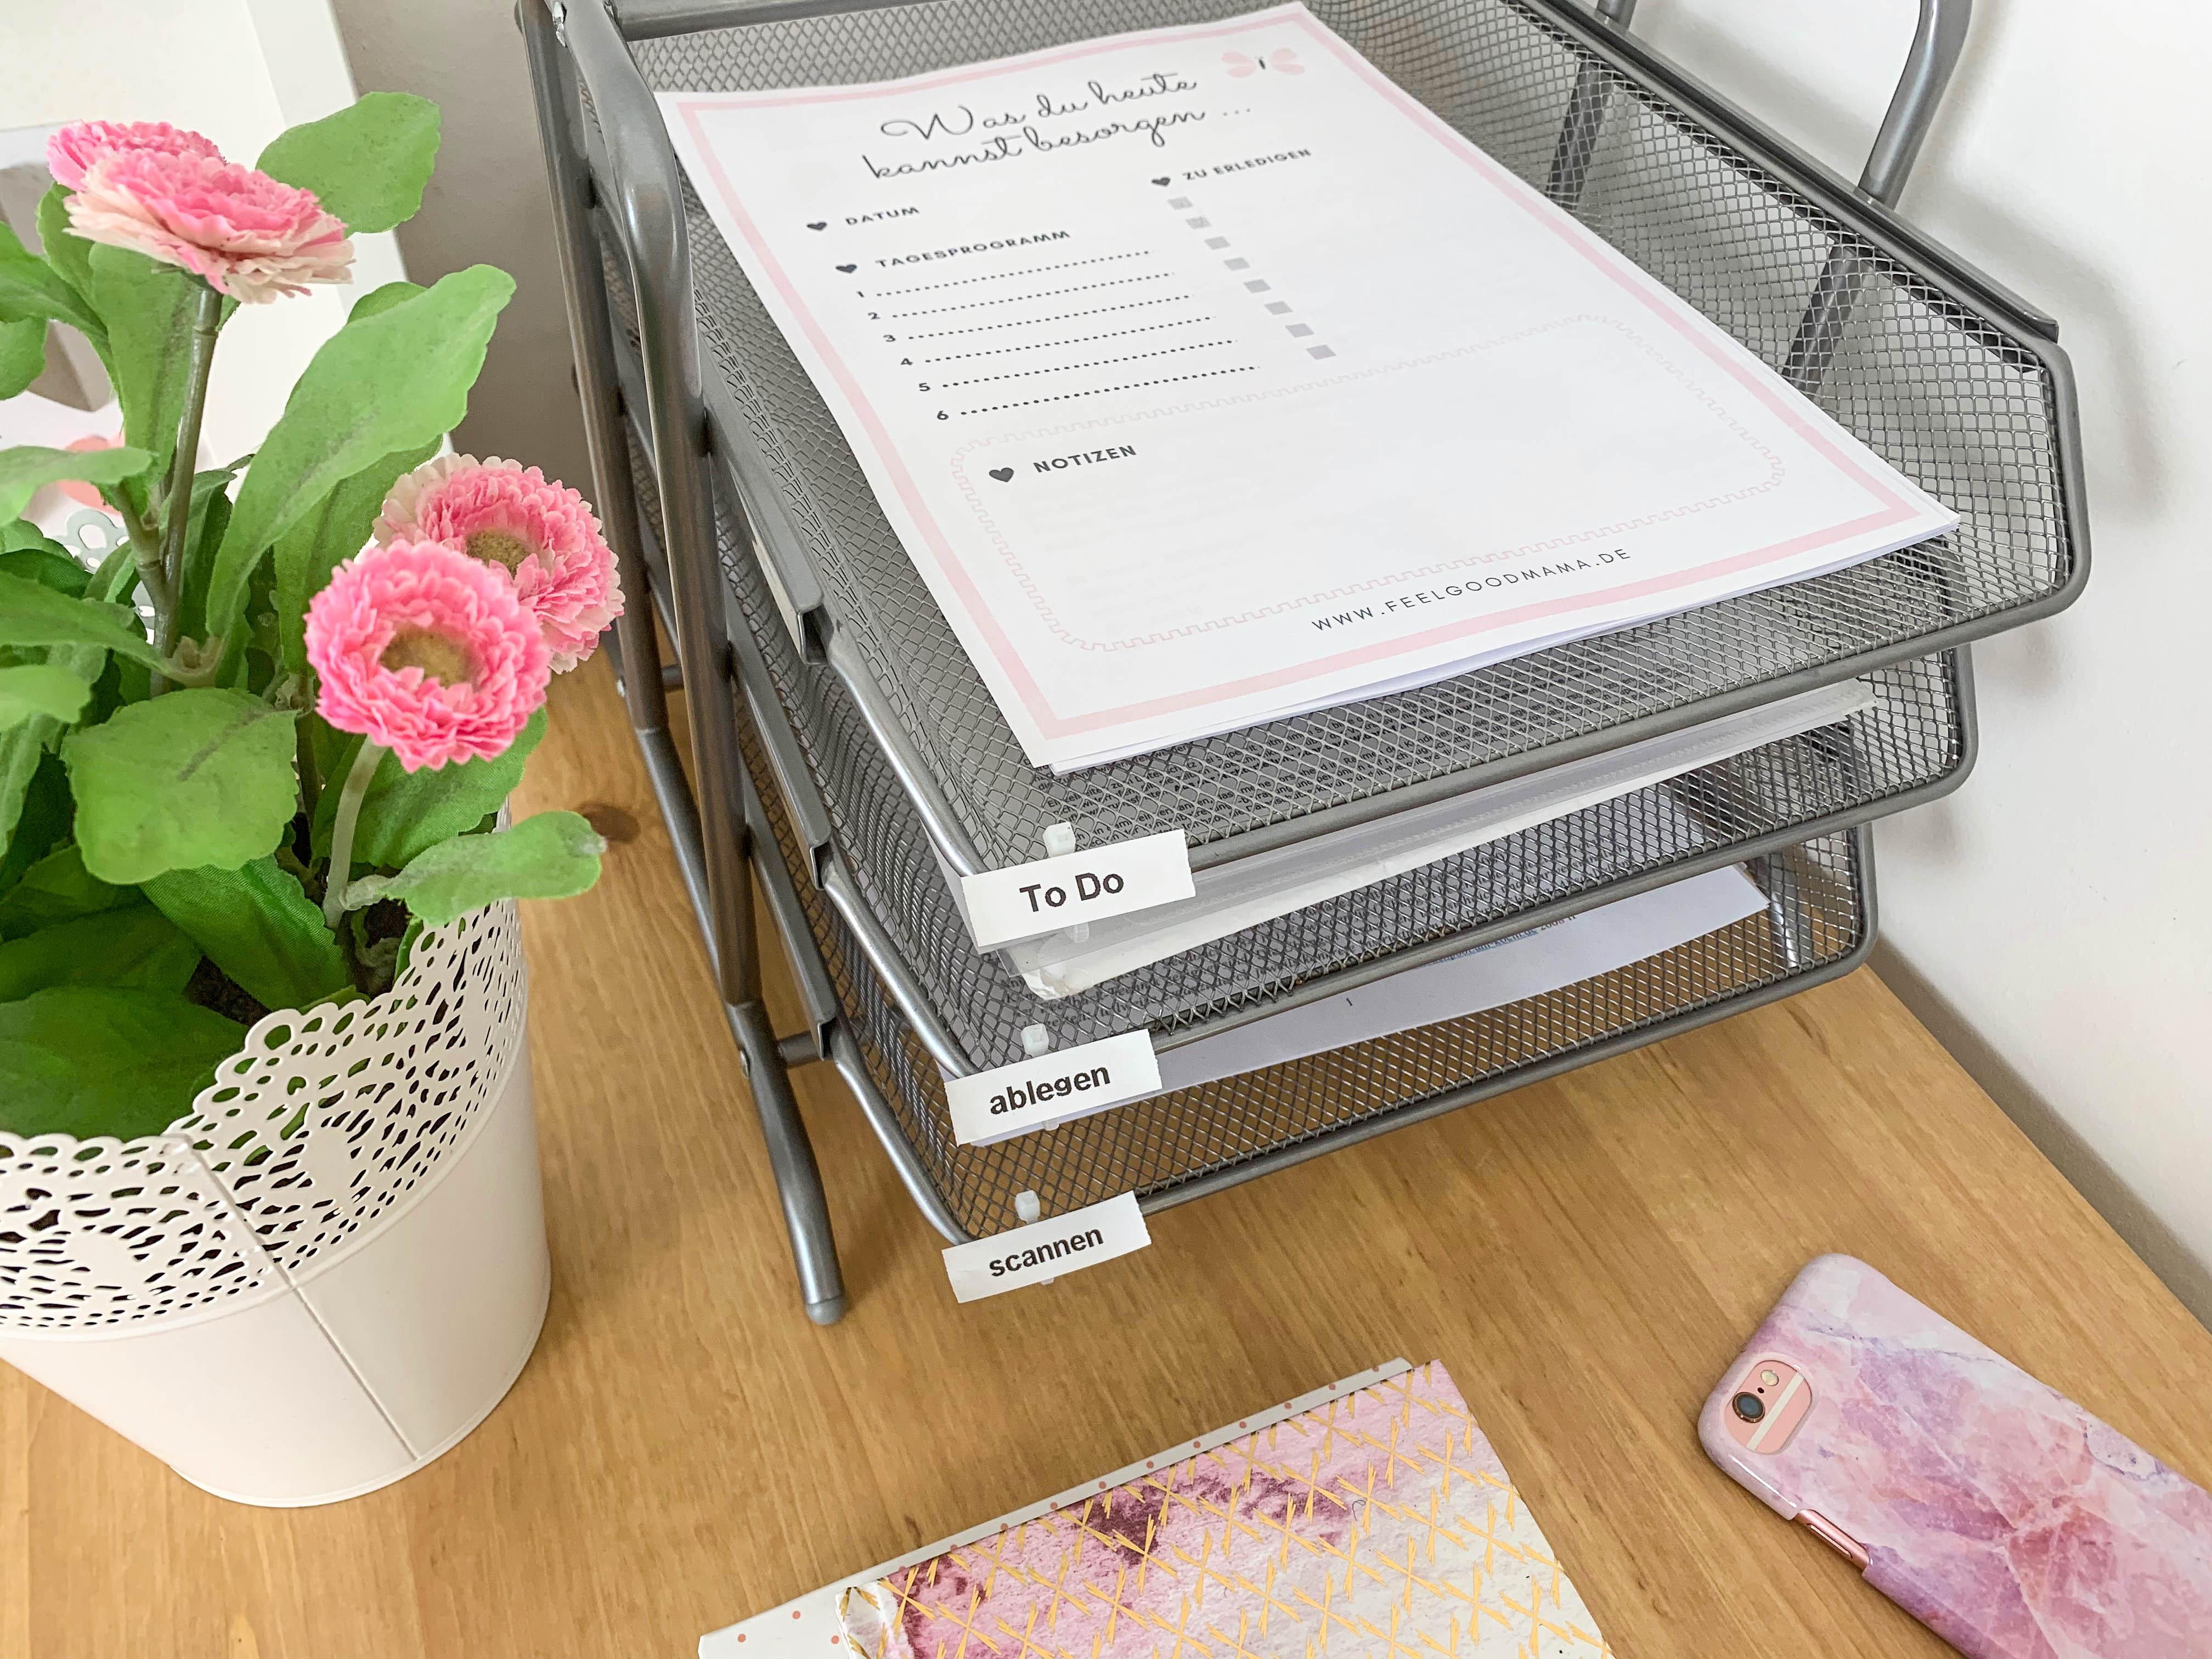 Organisation, organisieren, Papierablage, Papiere organisieren, Unterlagen sortieren, Unterlagen organisieren, Planung, Mama, Kinder, Familie, Papierchaos